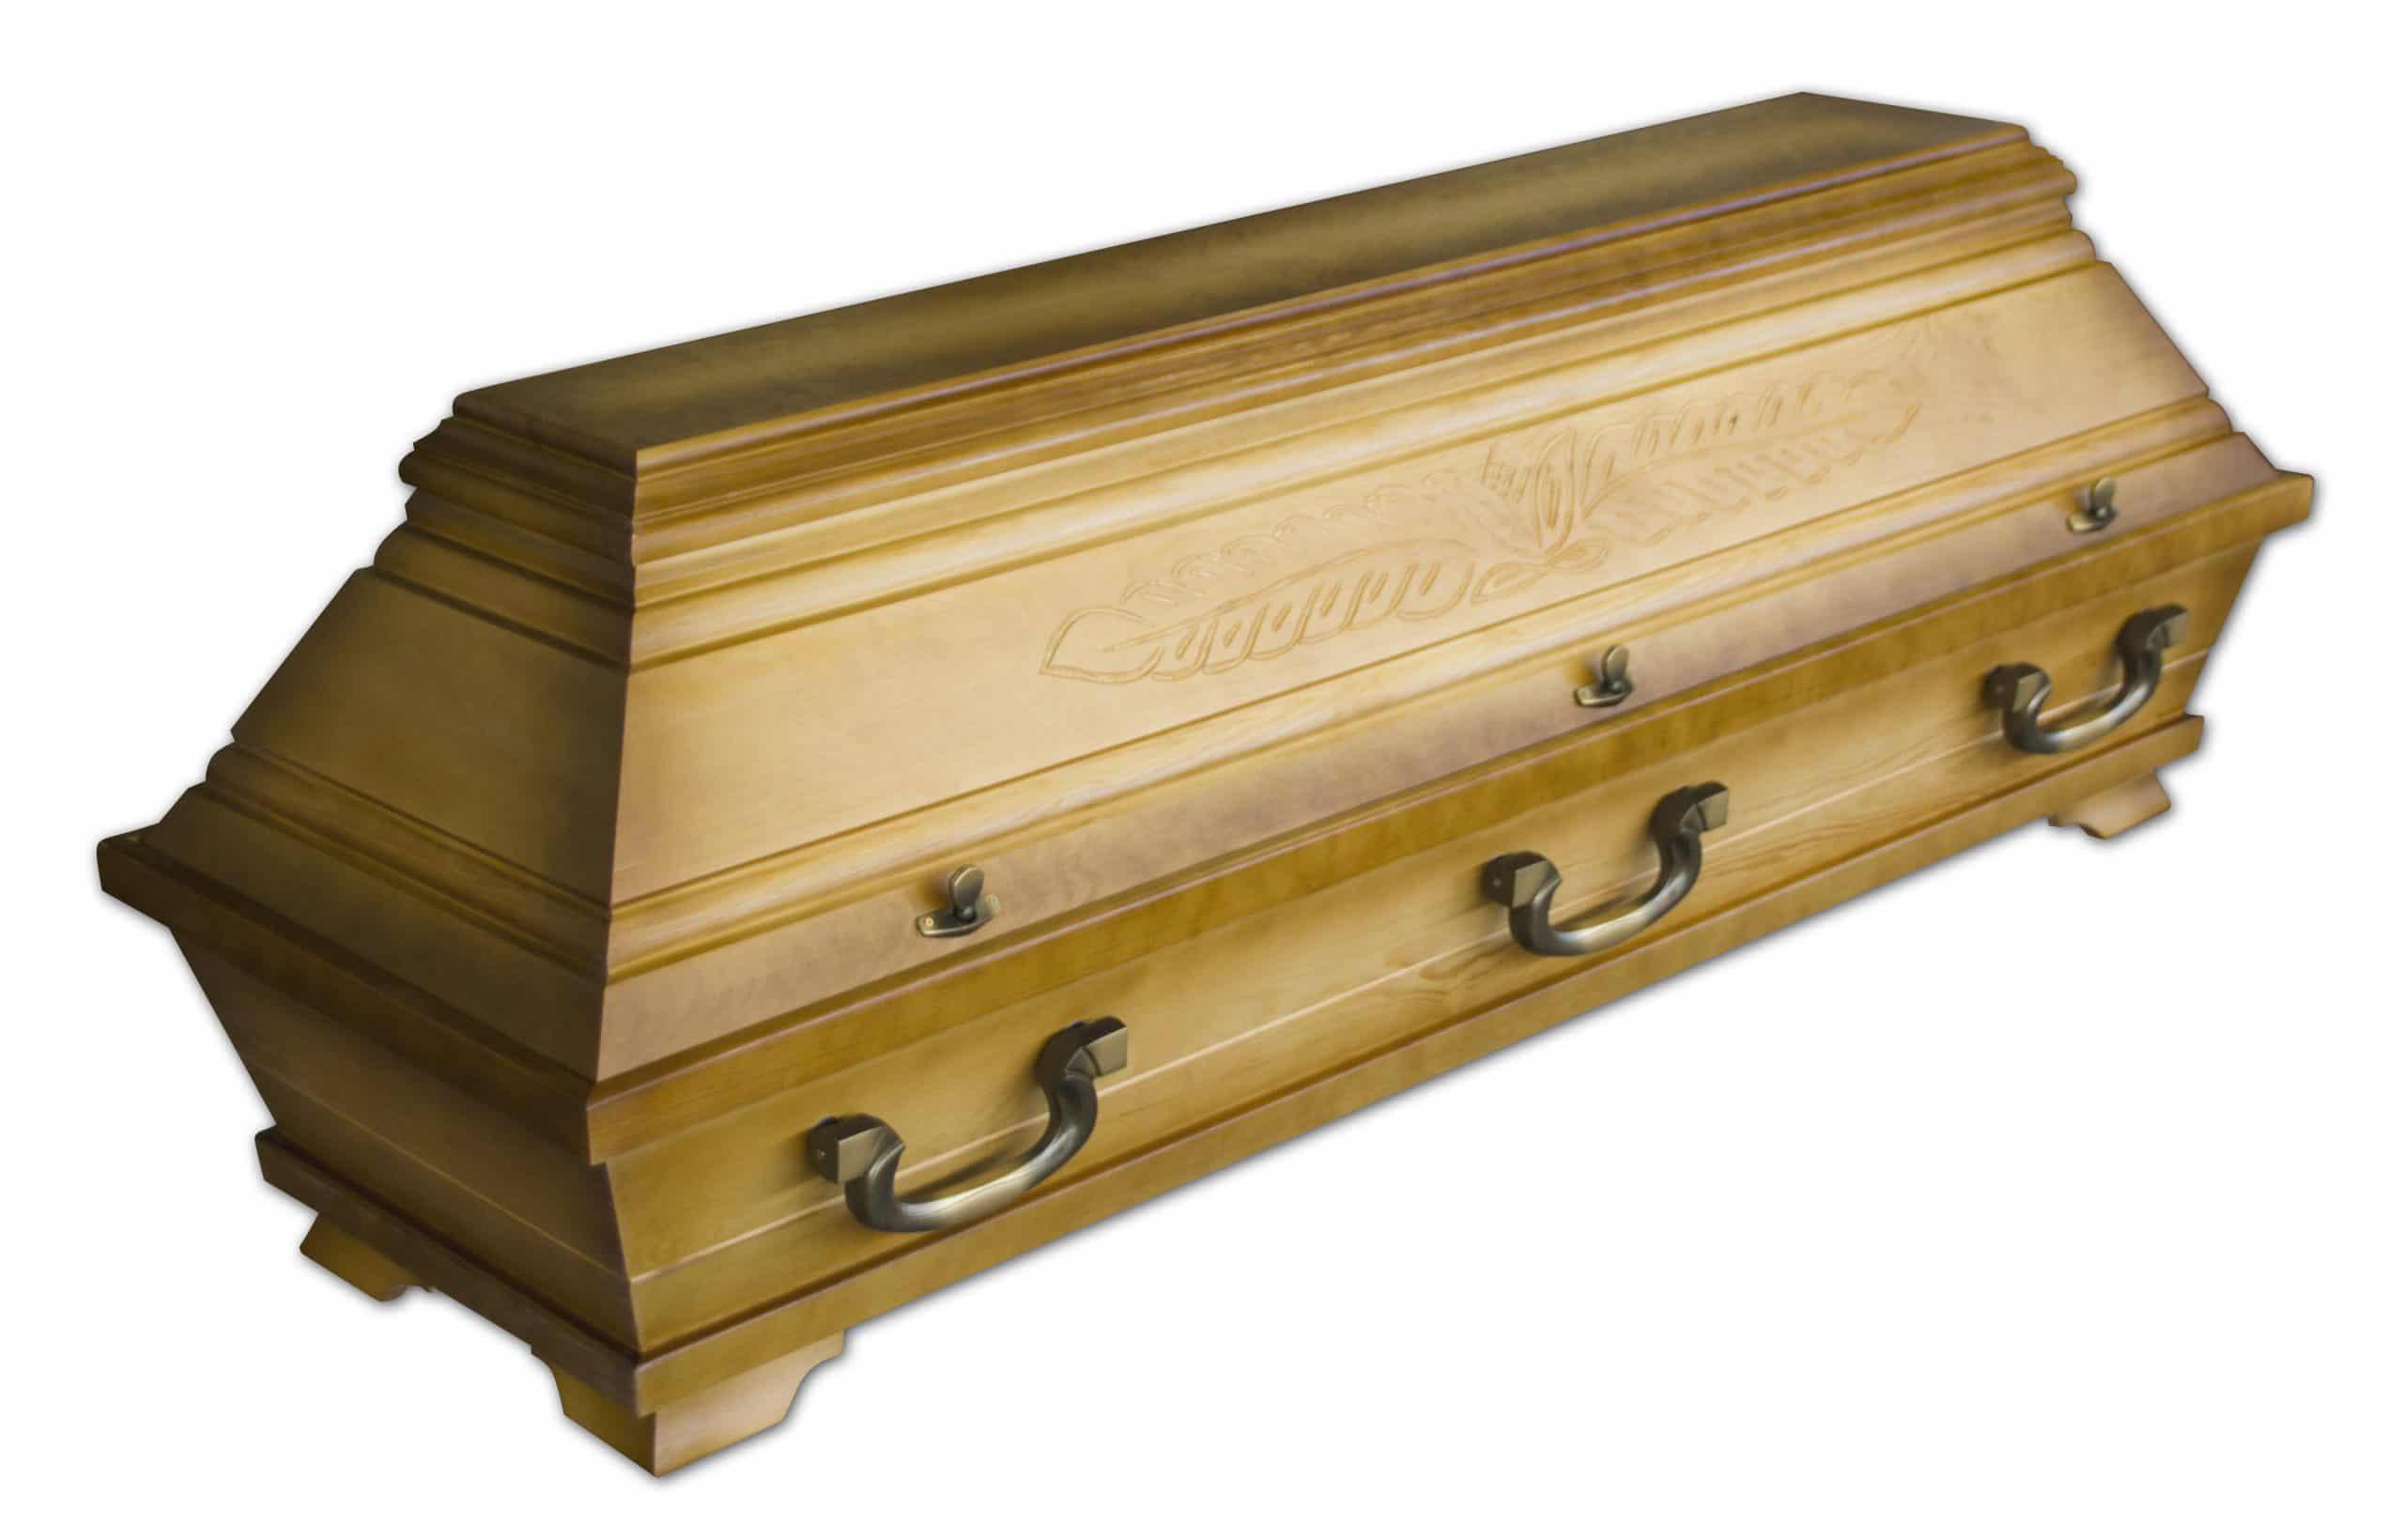 12 Kiefer Palme Patina scaled Abel Bestattungen